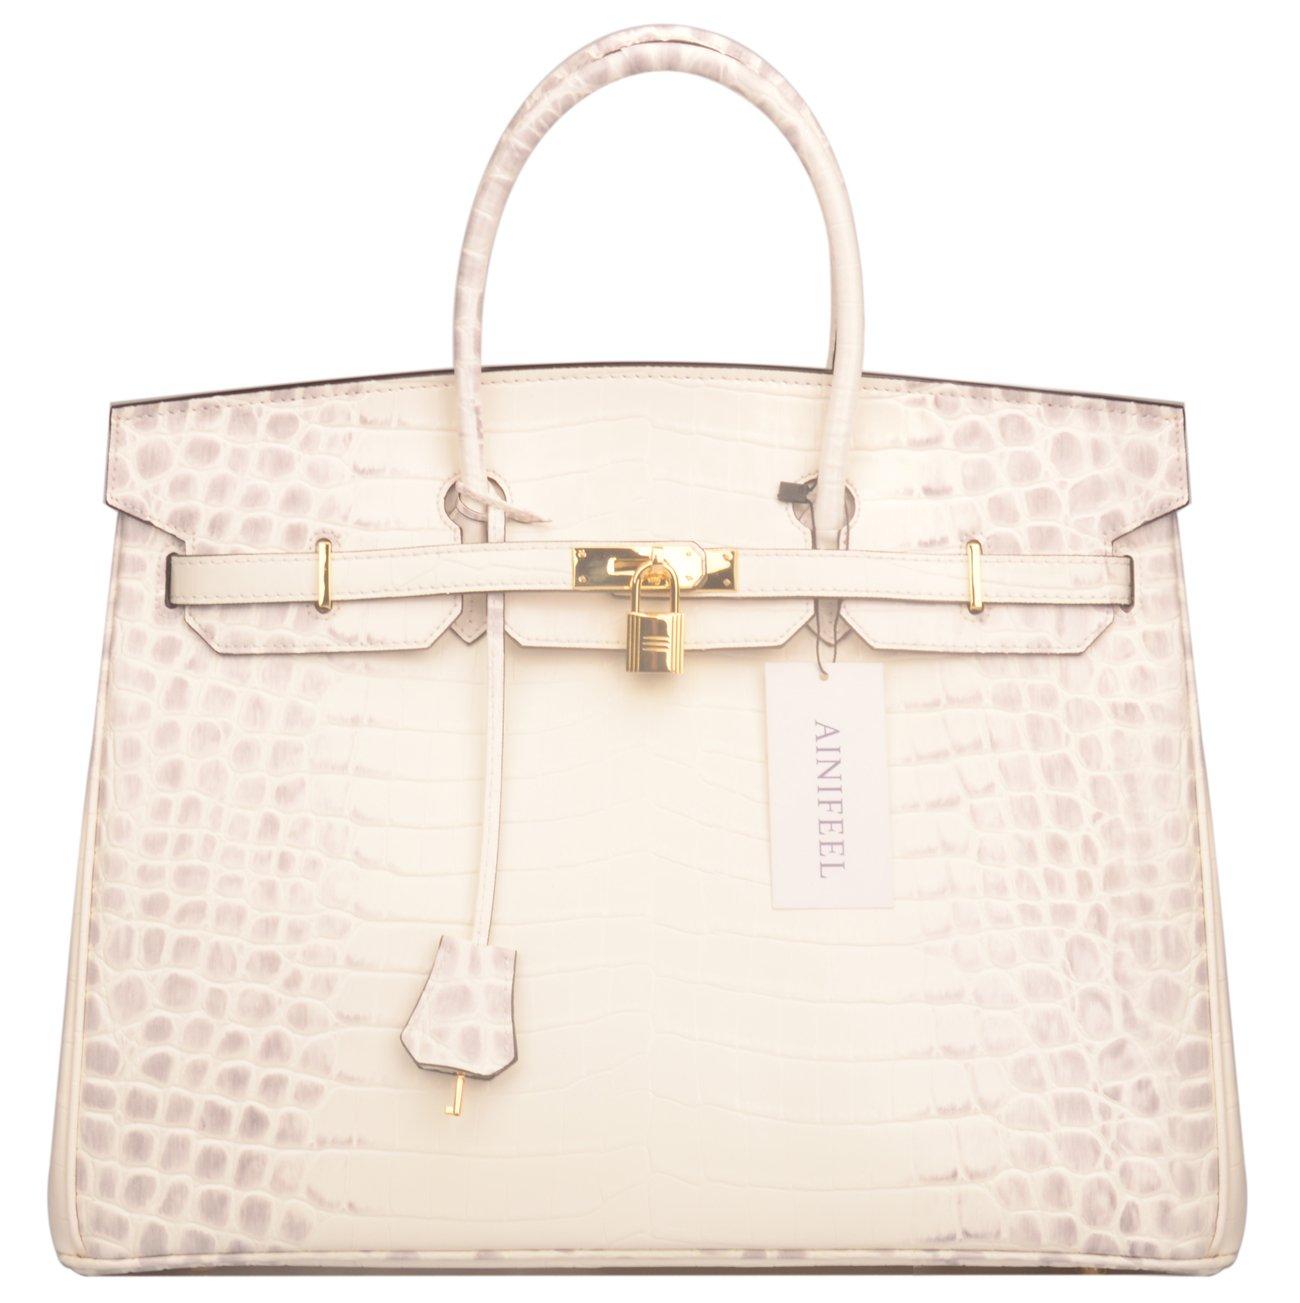 Ainifeel 40cm Oversized Patent Leather Padlock Handbag Business Purse (40cm OVERSIZE, Himalayan) by Ainifeel (Image #2)